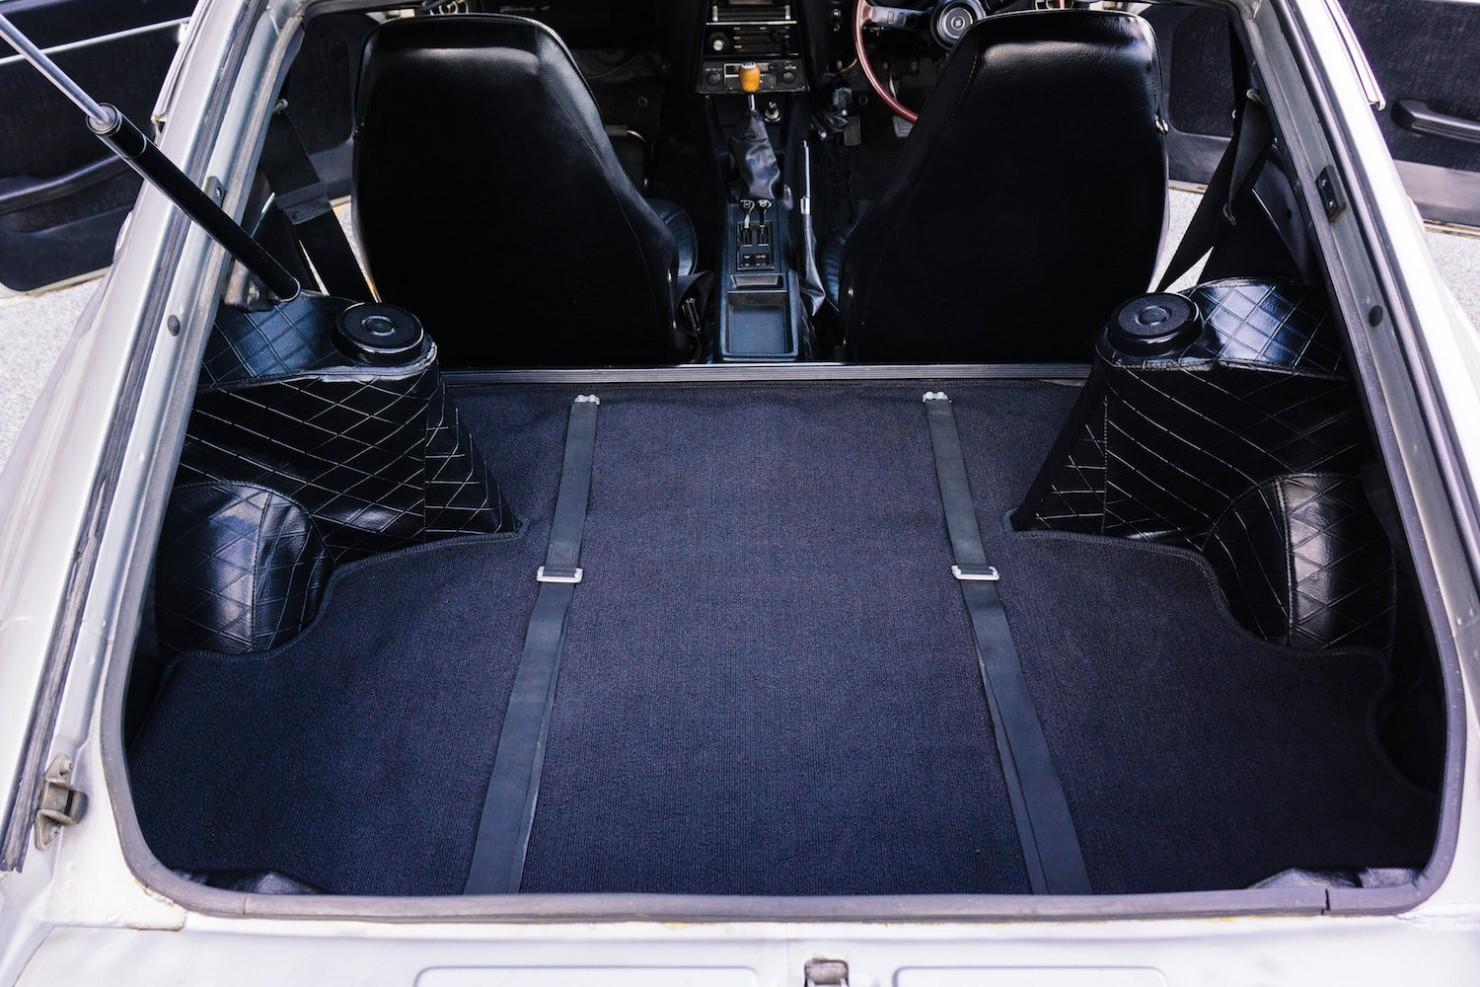 Nissan-Fairlady-Z-432-18